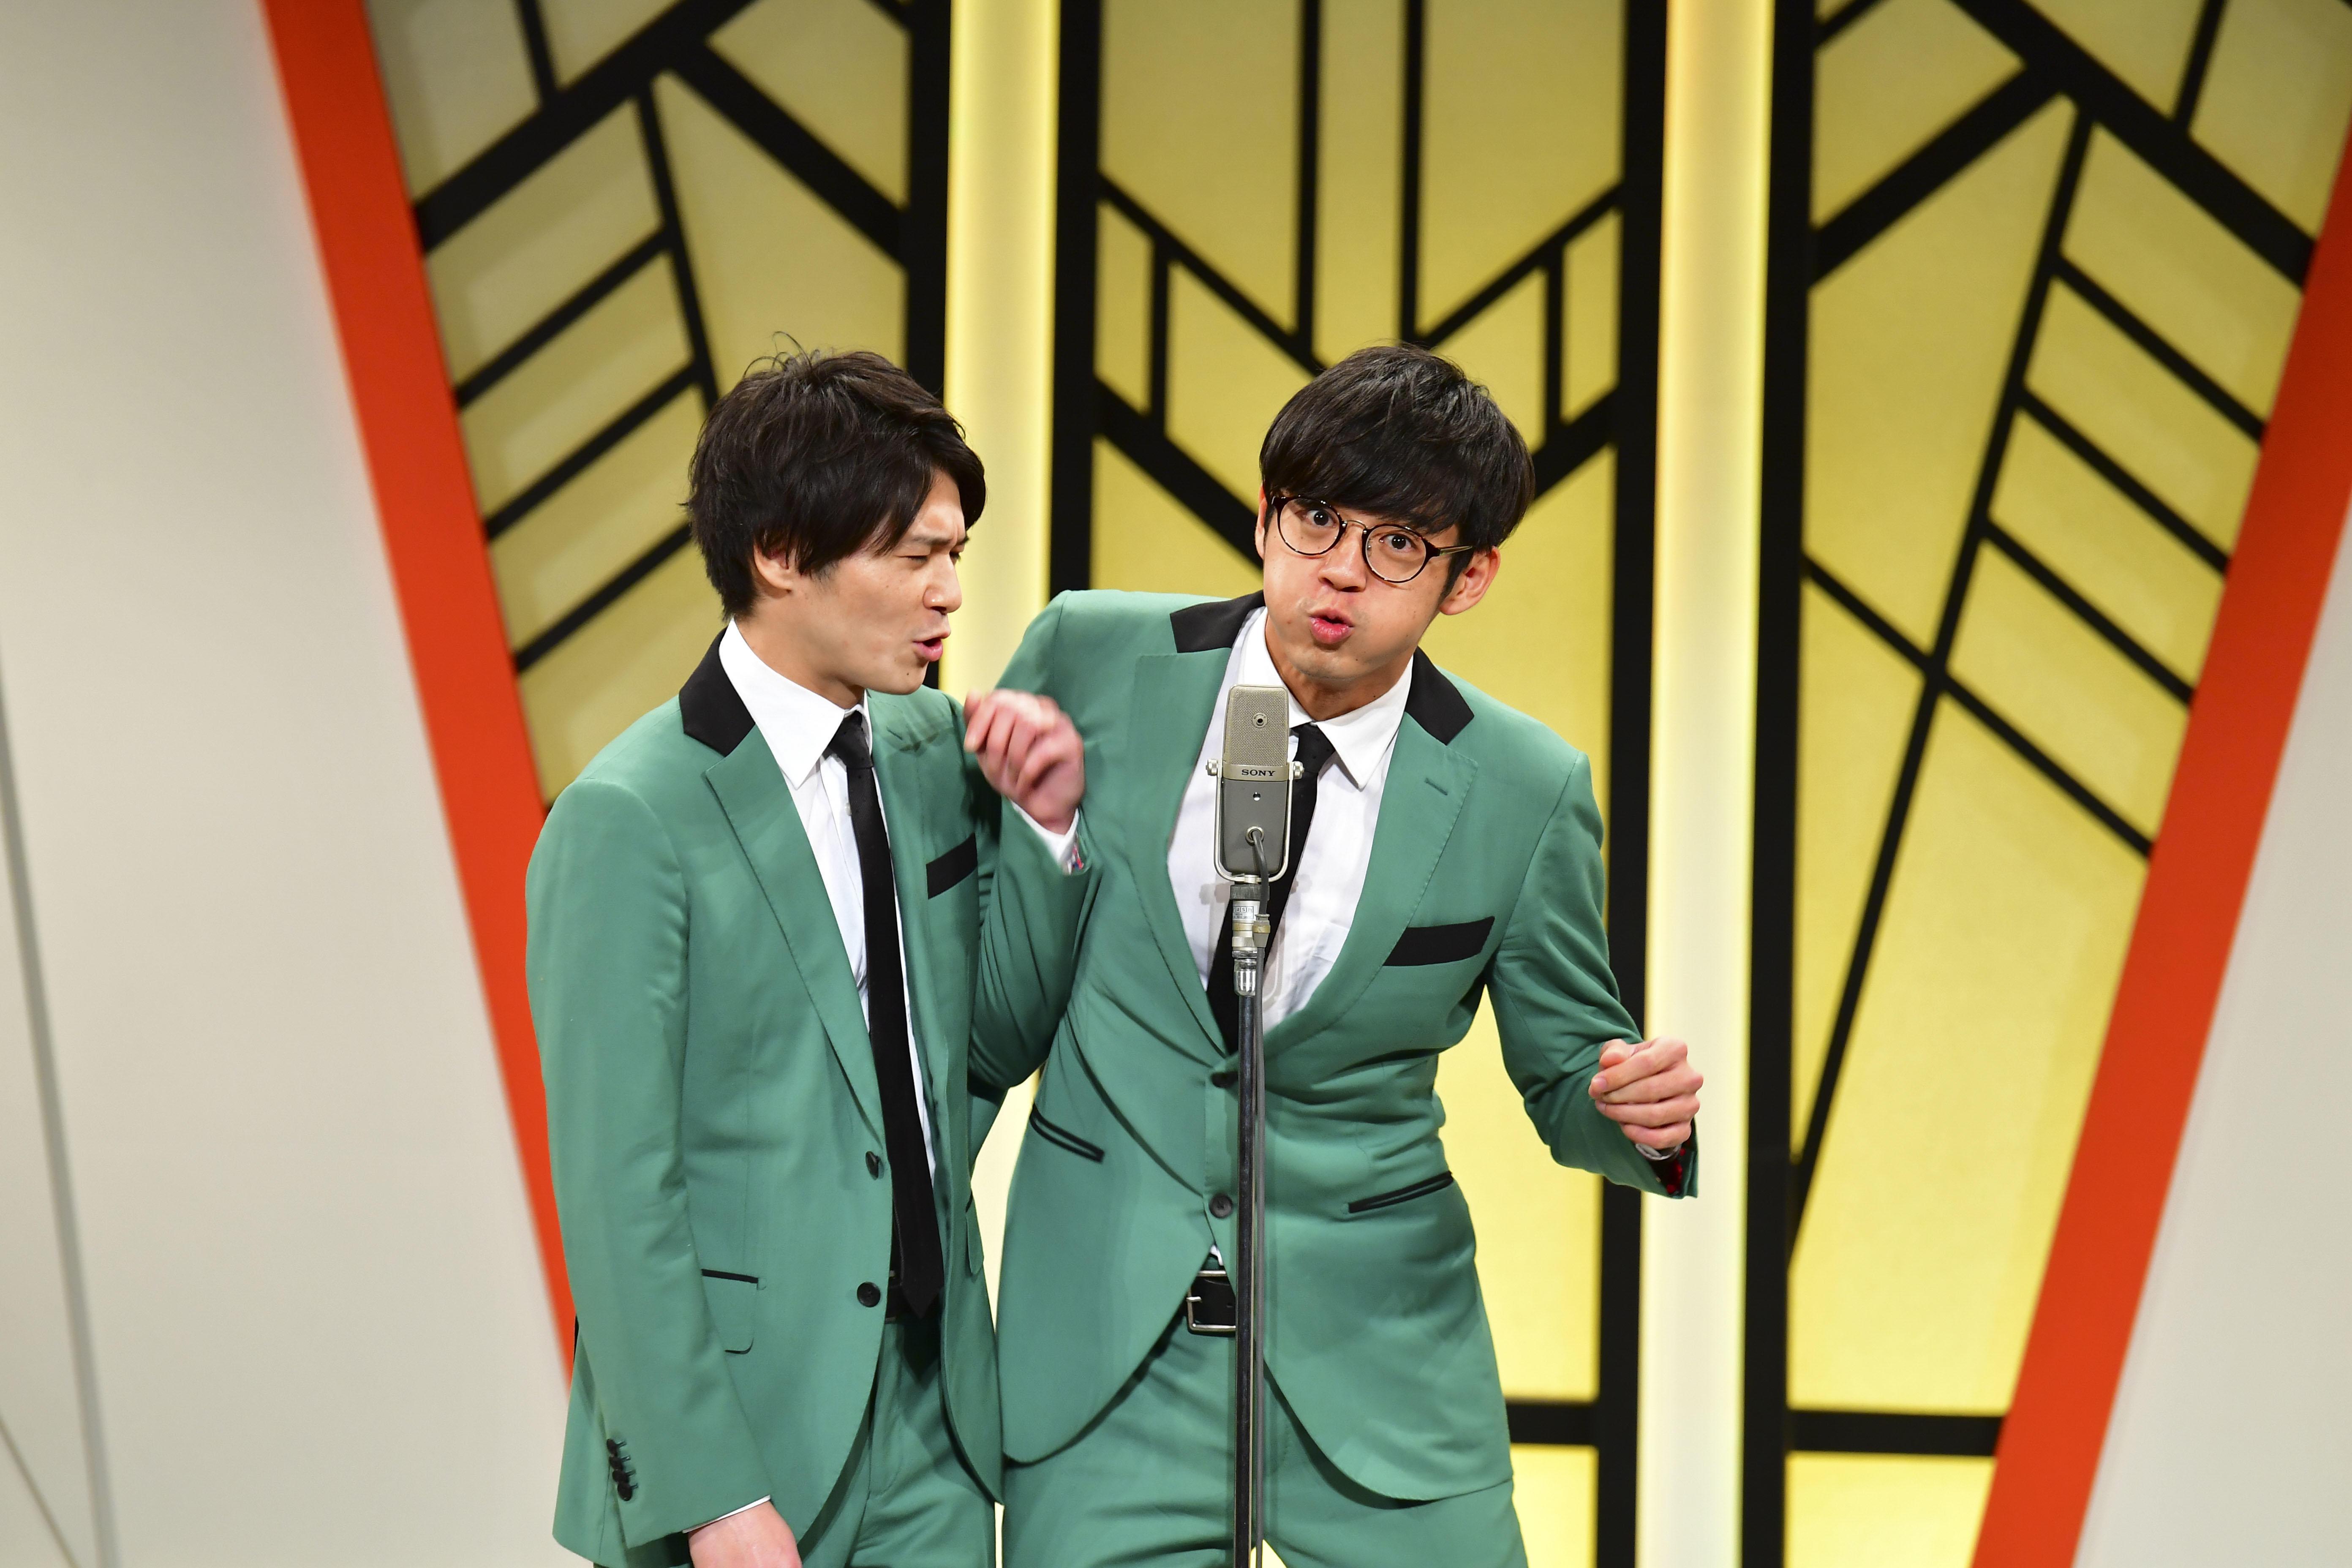 http://news.yoshimoto.co.jp/20171201191121-2bef1de49ee363231901cfd67948404e91f3d3b7.jpg